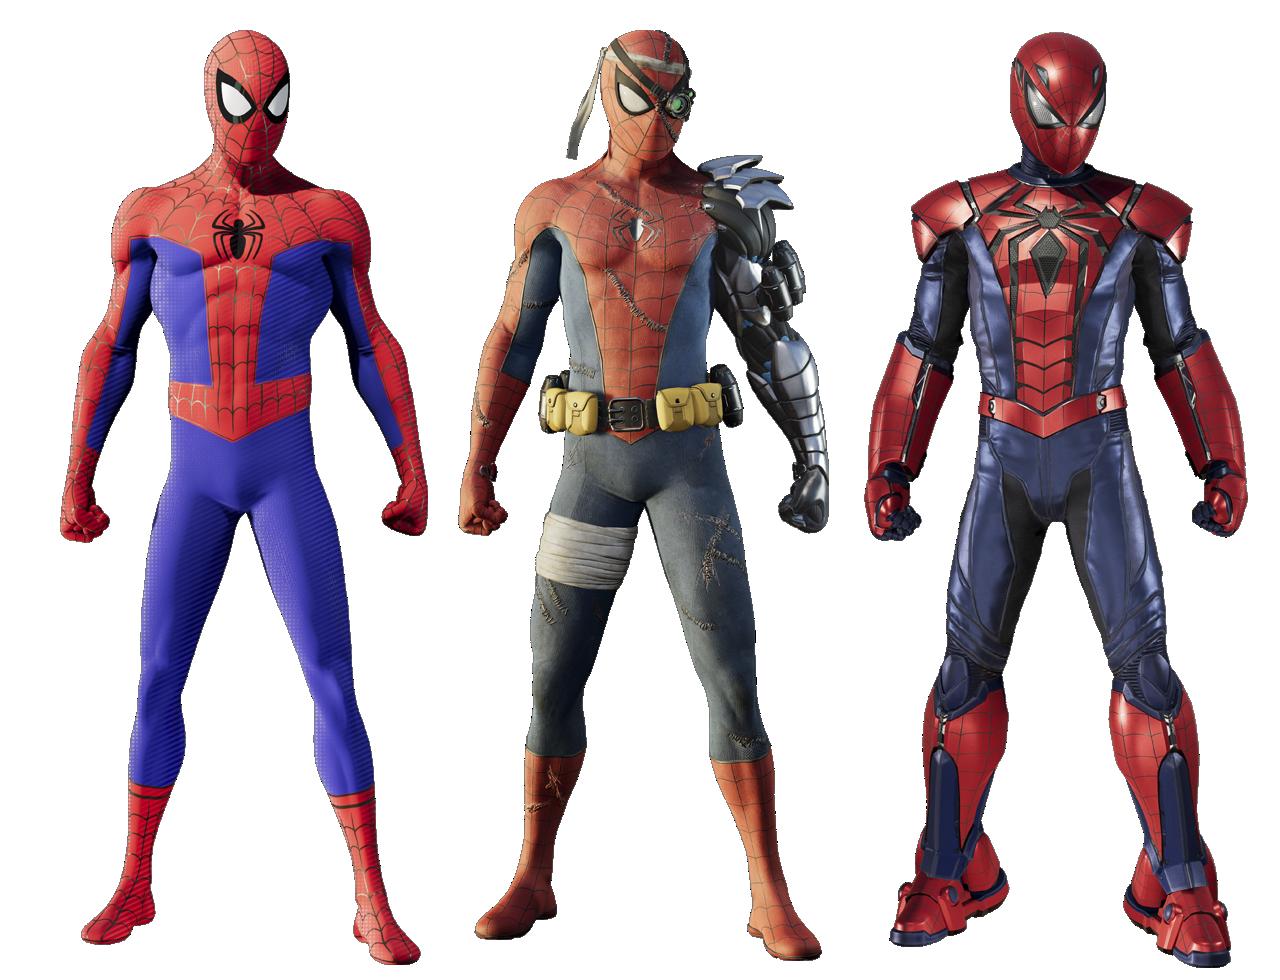 spider-man bonus suit silver lining